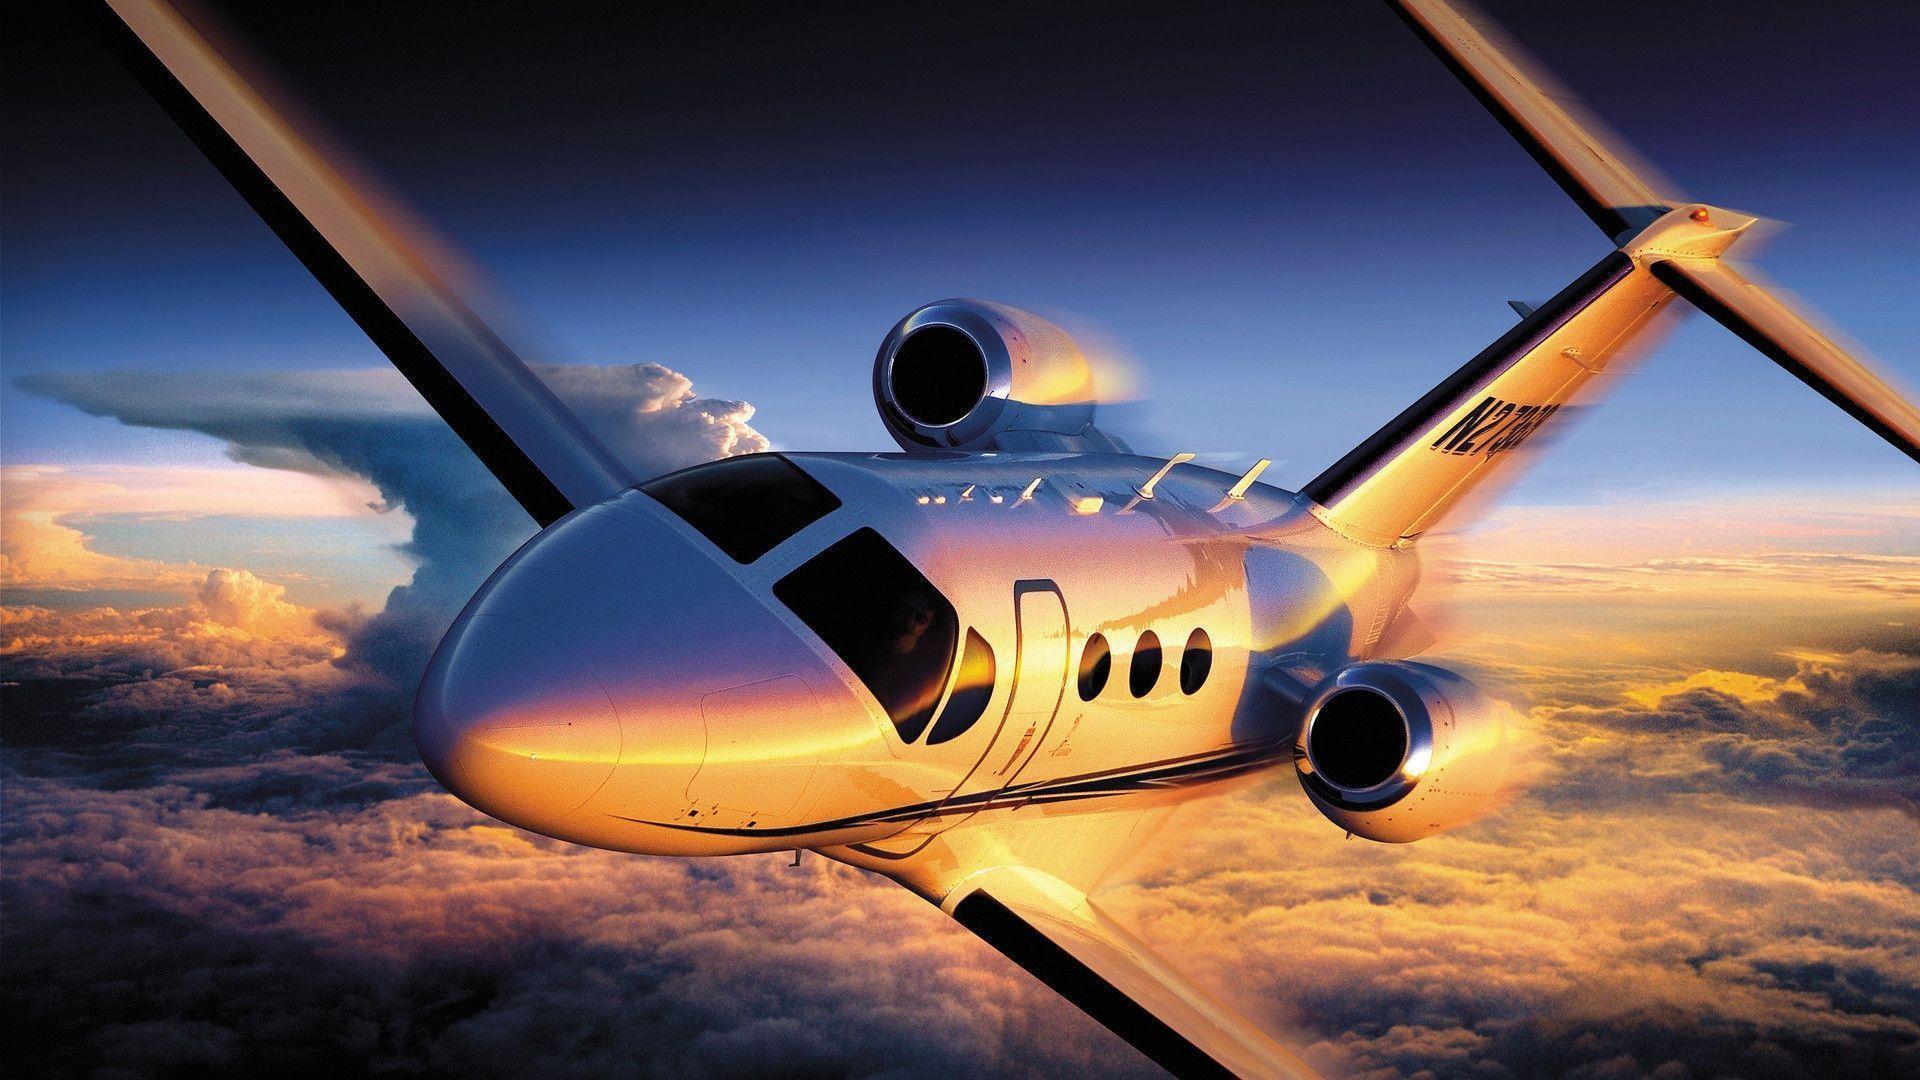 Aeroplane Wallpapers Top Free Aeroplane Backgrounds